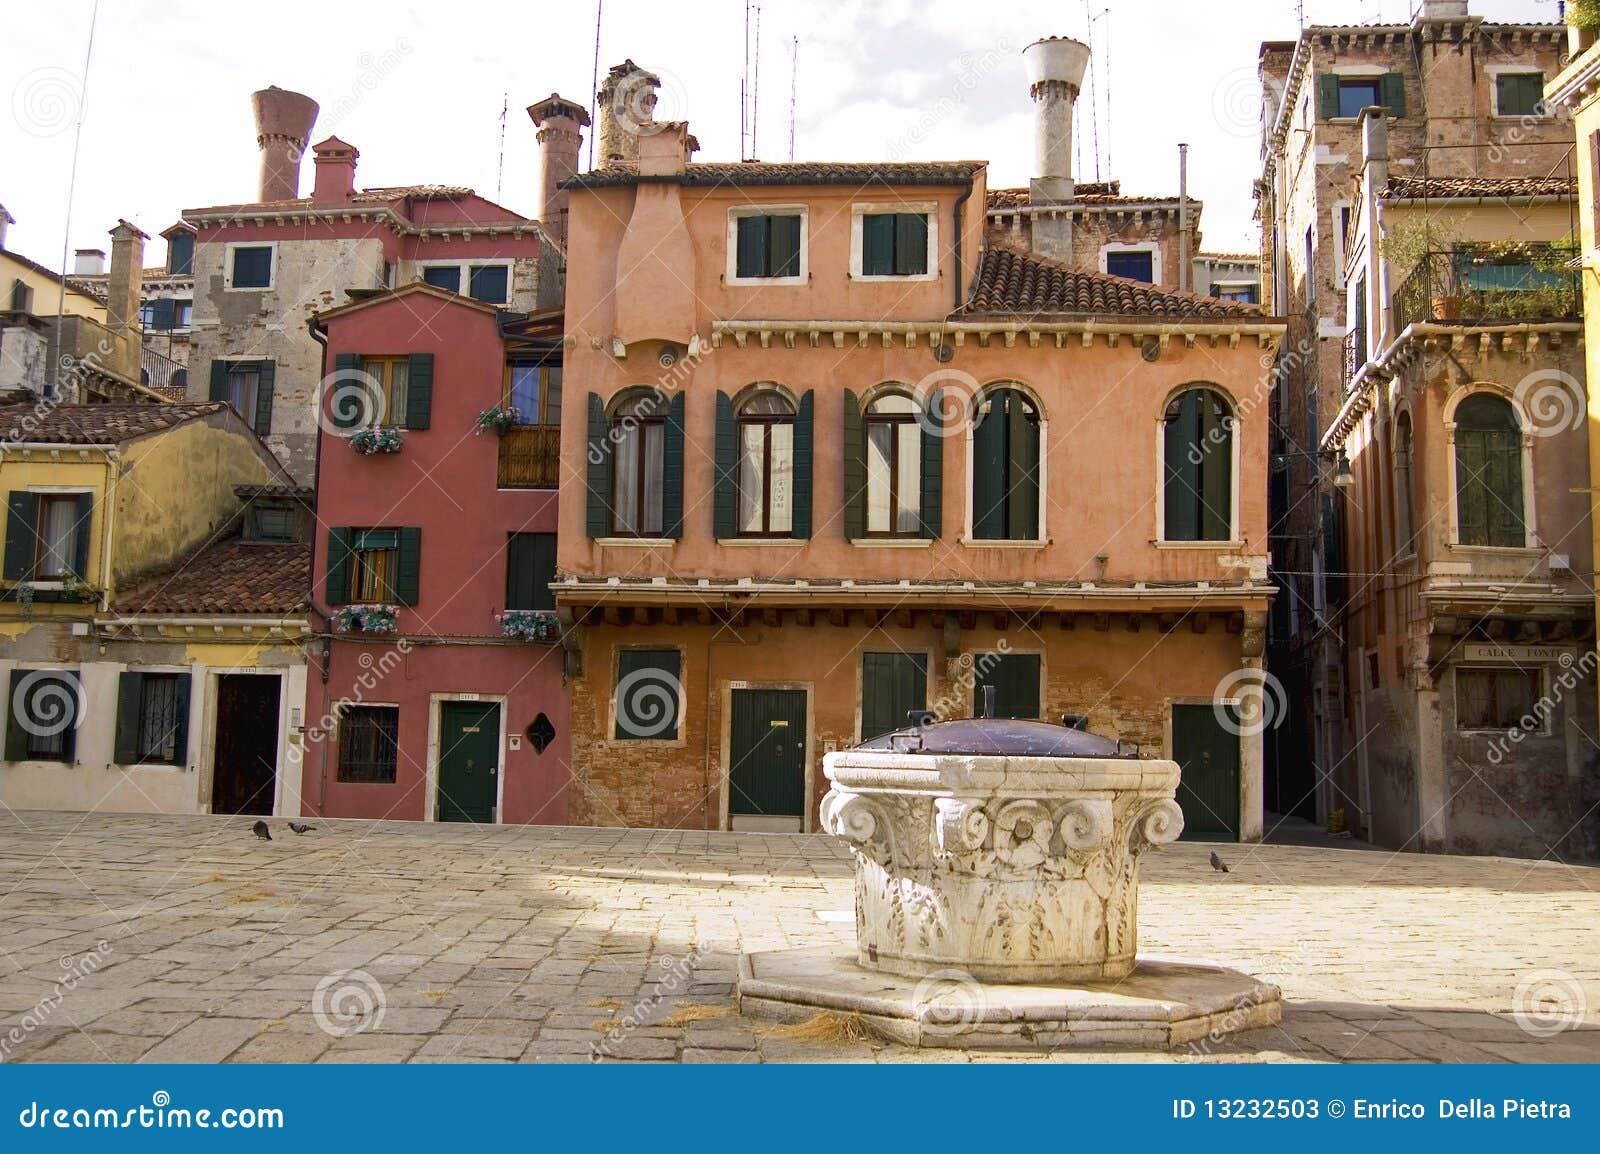 venetian architecture stock image image of touristic